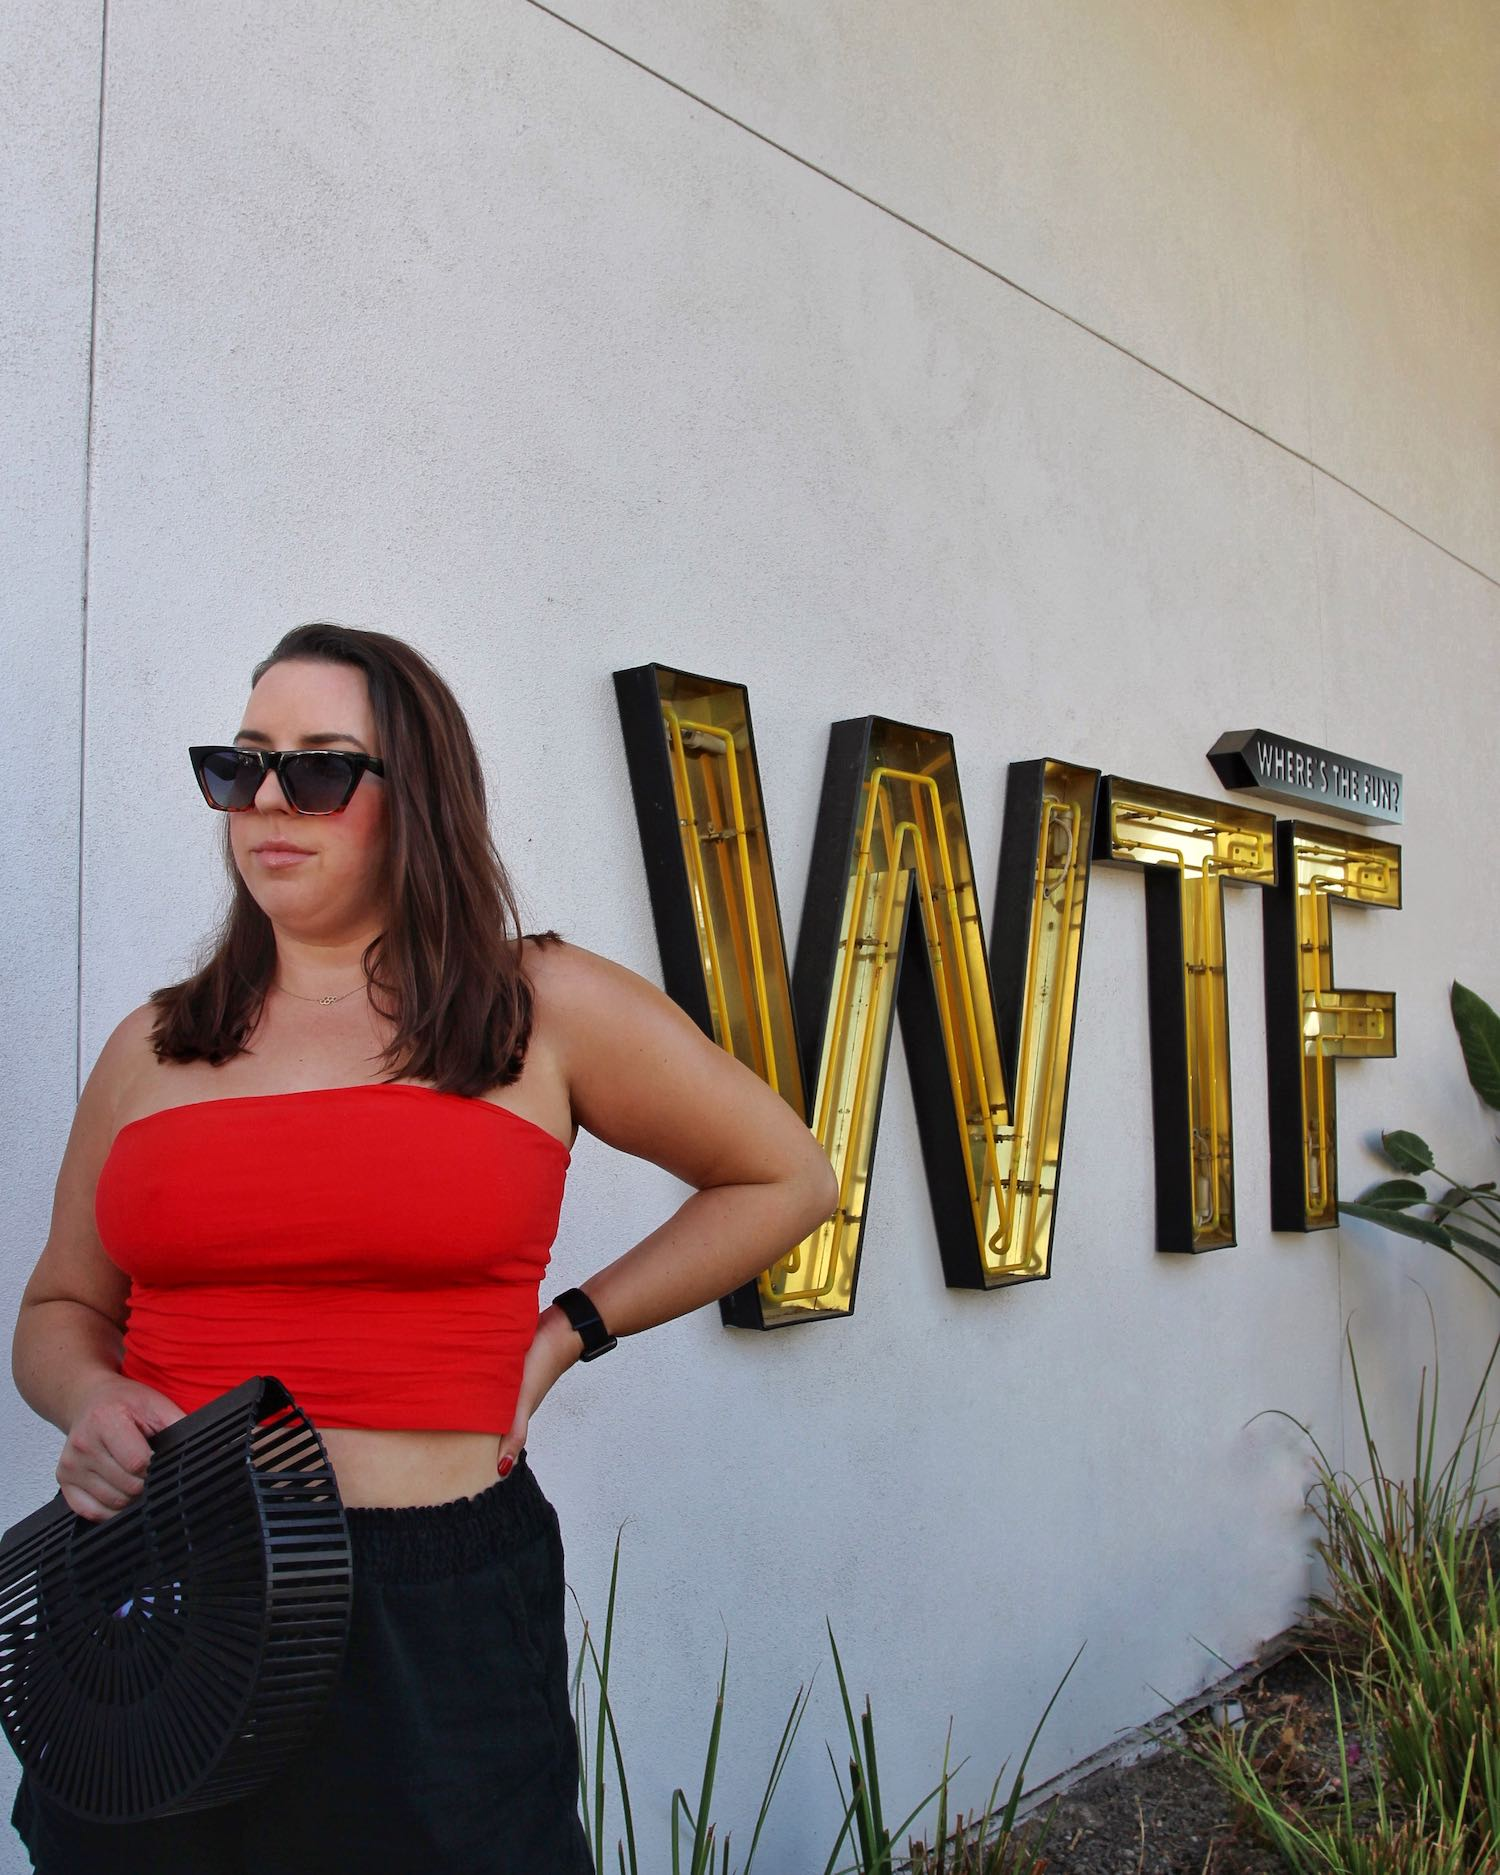 Hotel Adeline WTF Sign